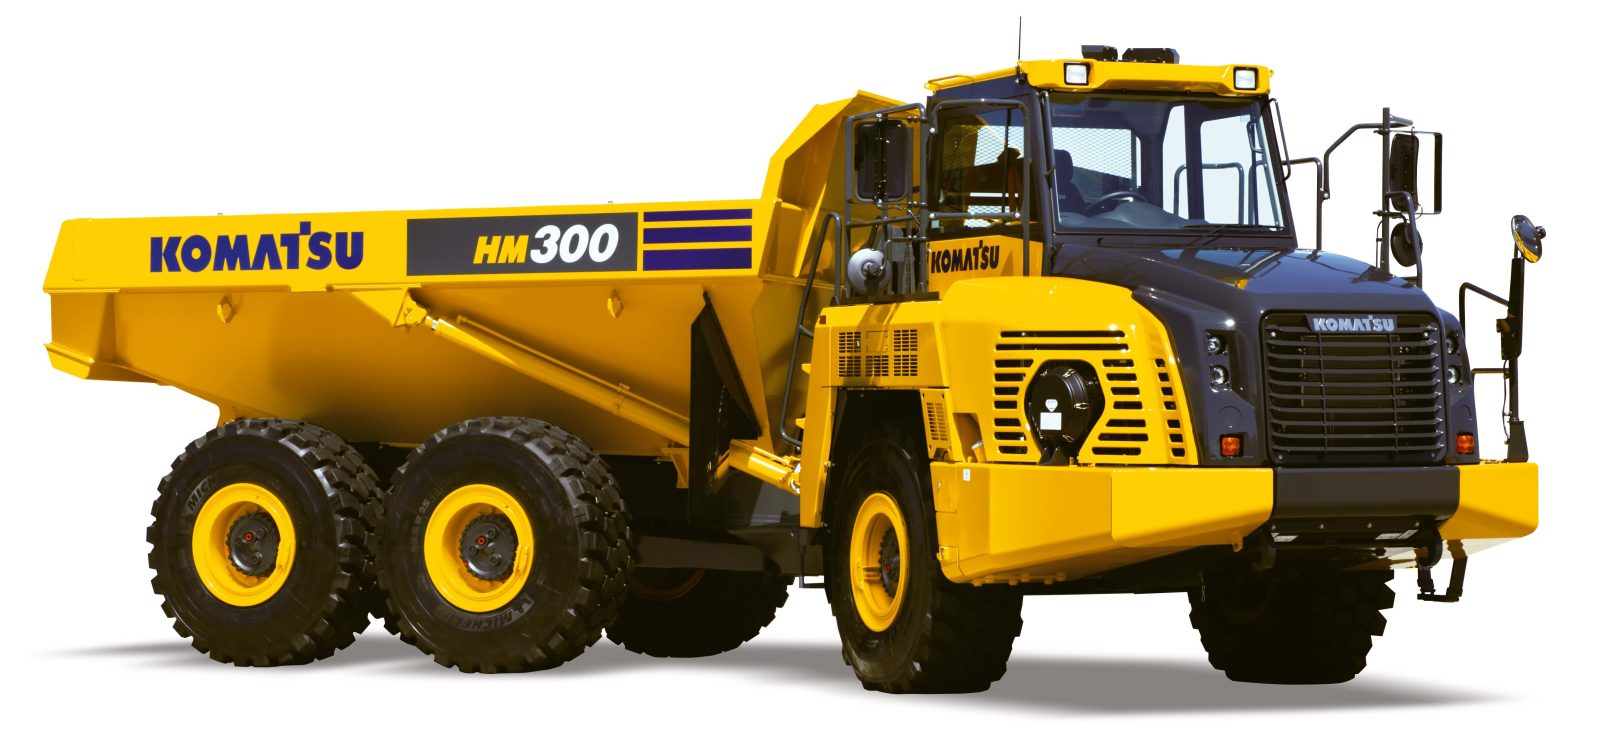 HM300-5